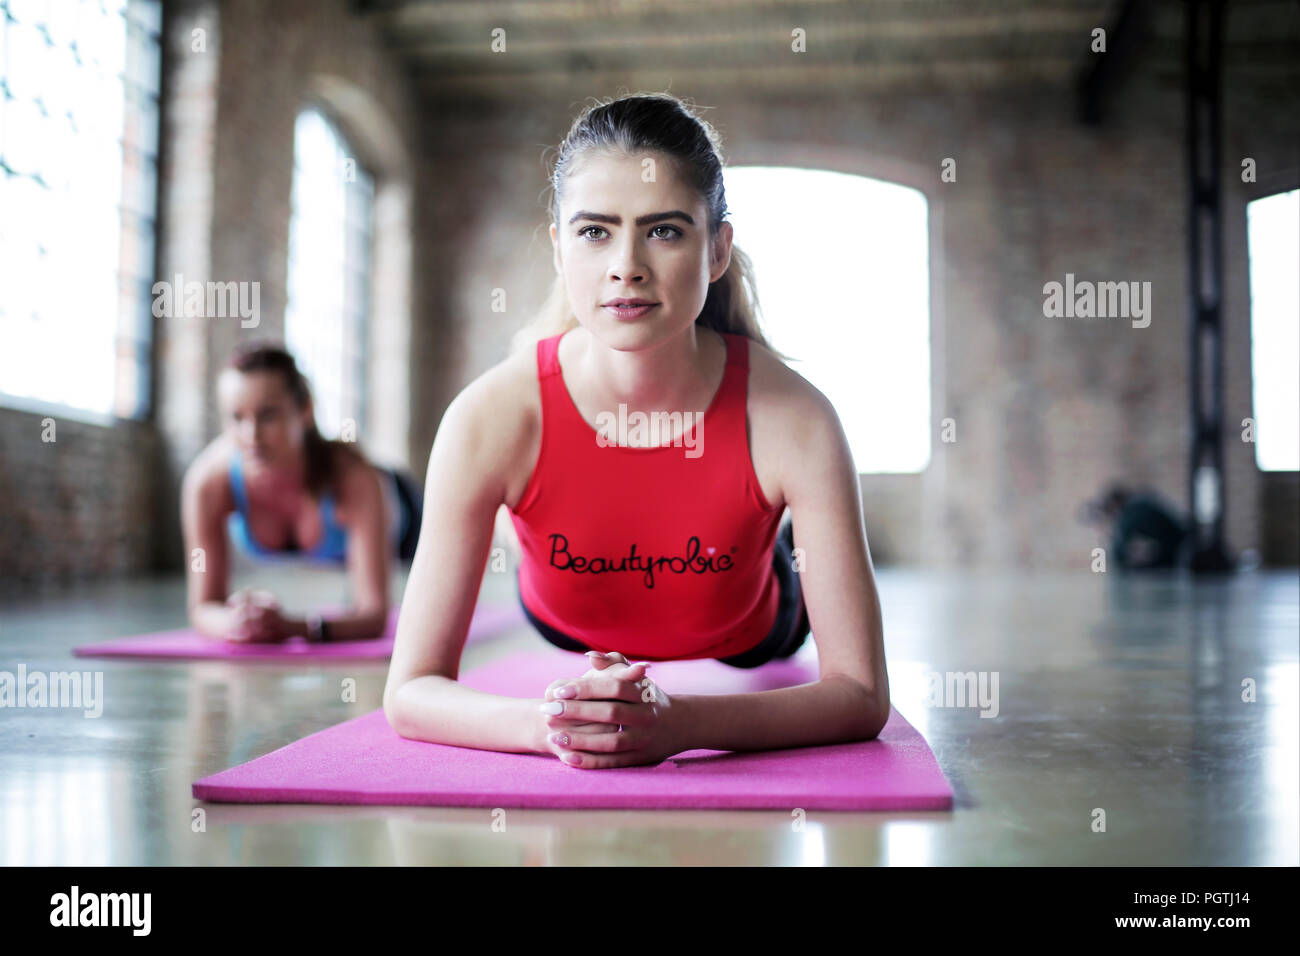 Beautiful Women Enjoying Aerobics On Gym, women workout on mat before gym training - Stock Image